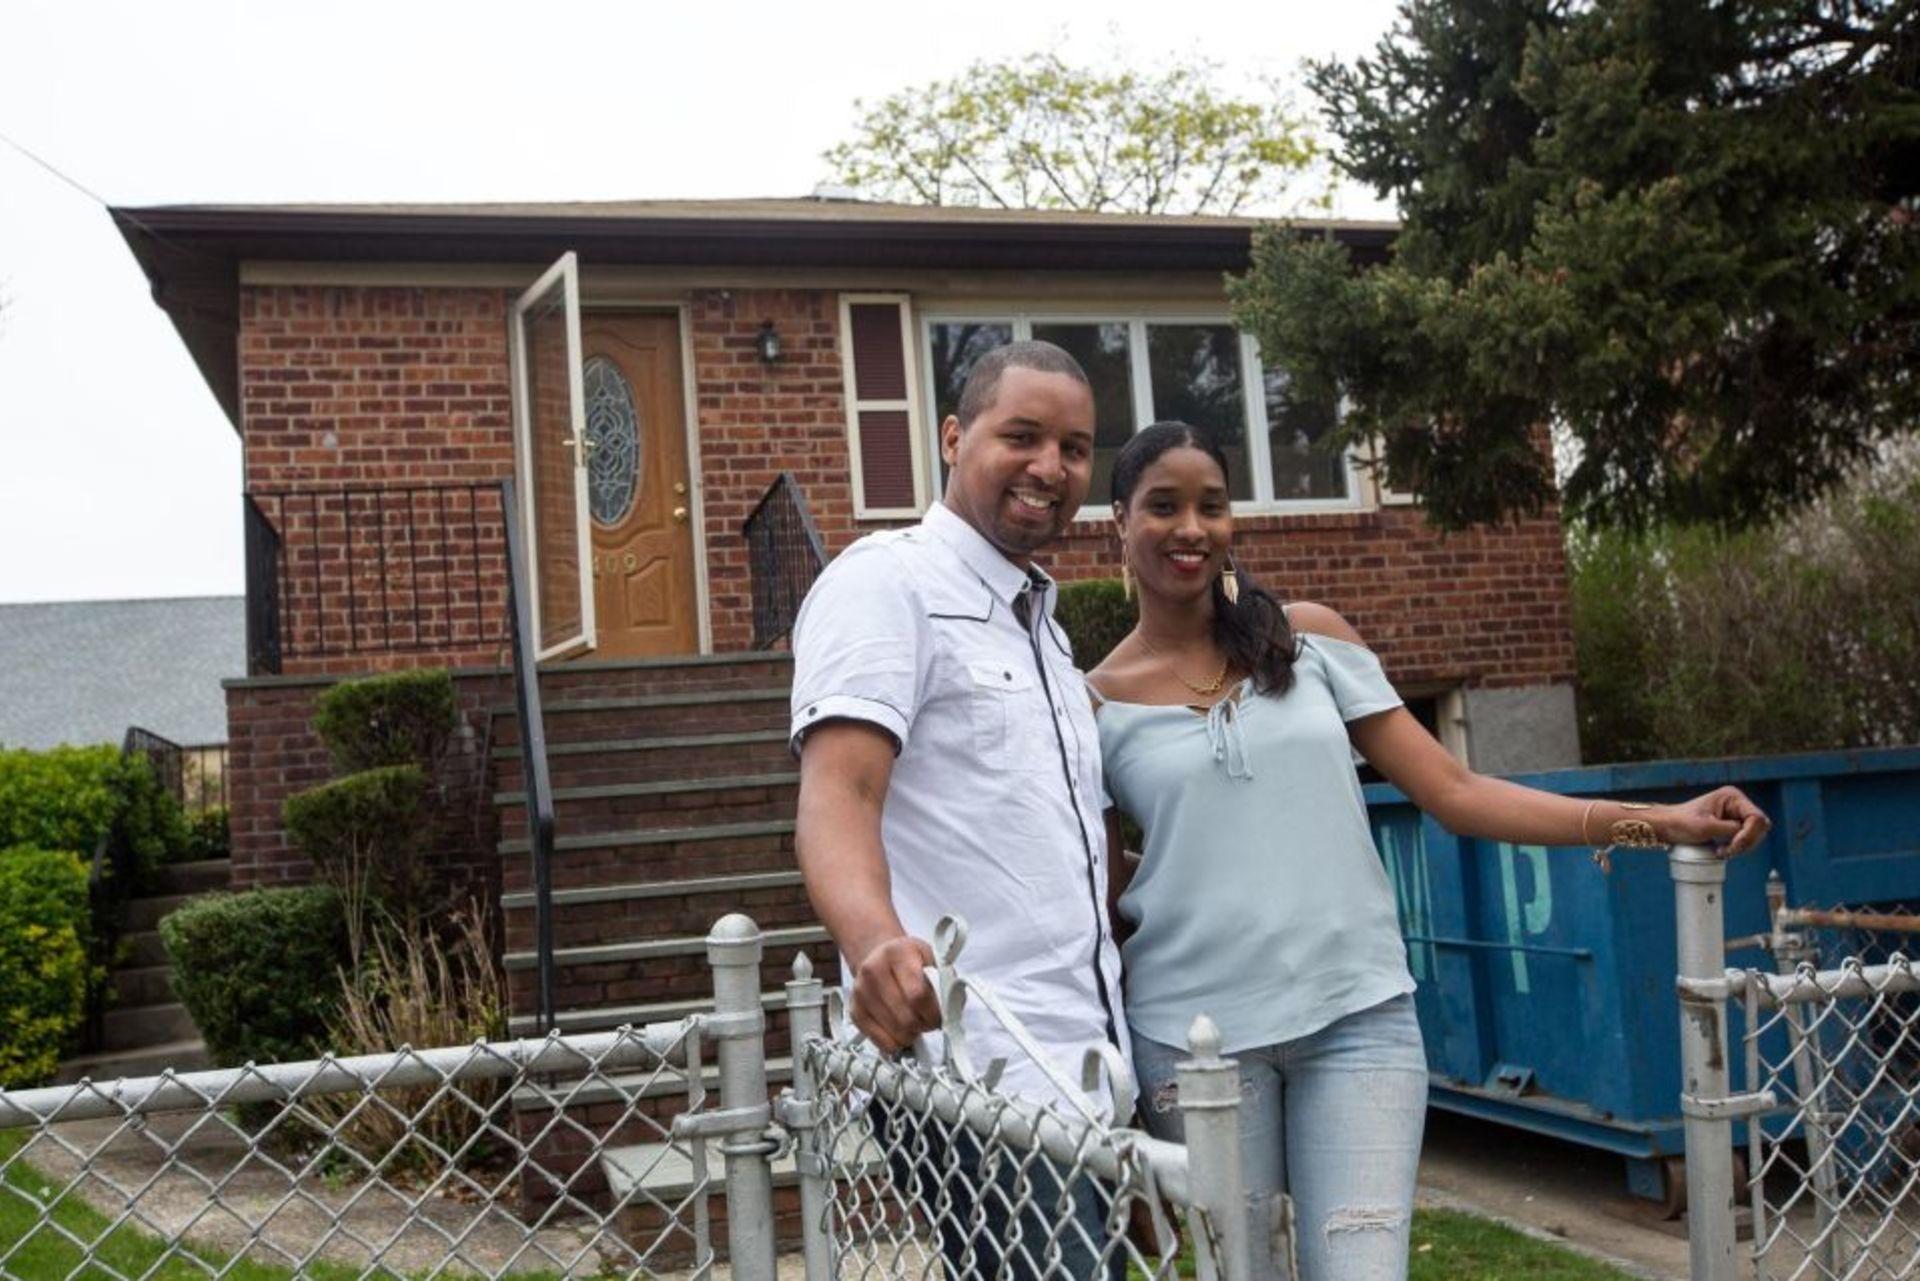 Millennials making resurgence, buying homes on Long Island